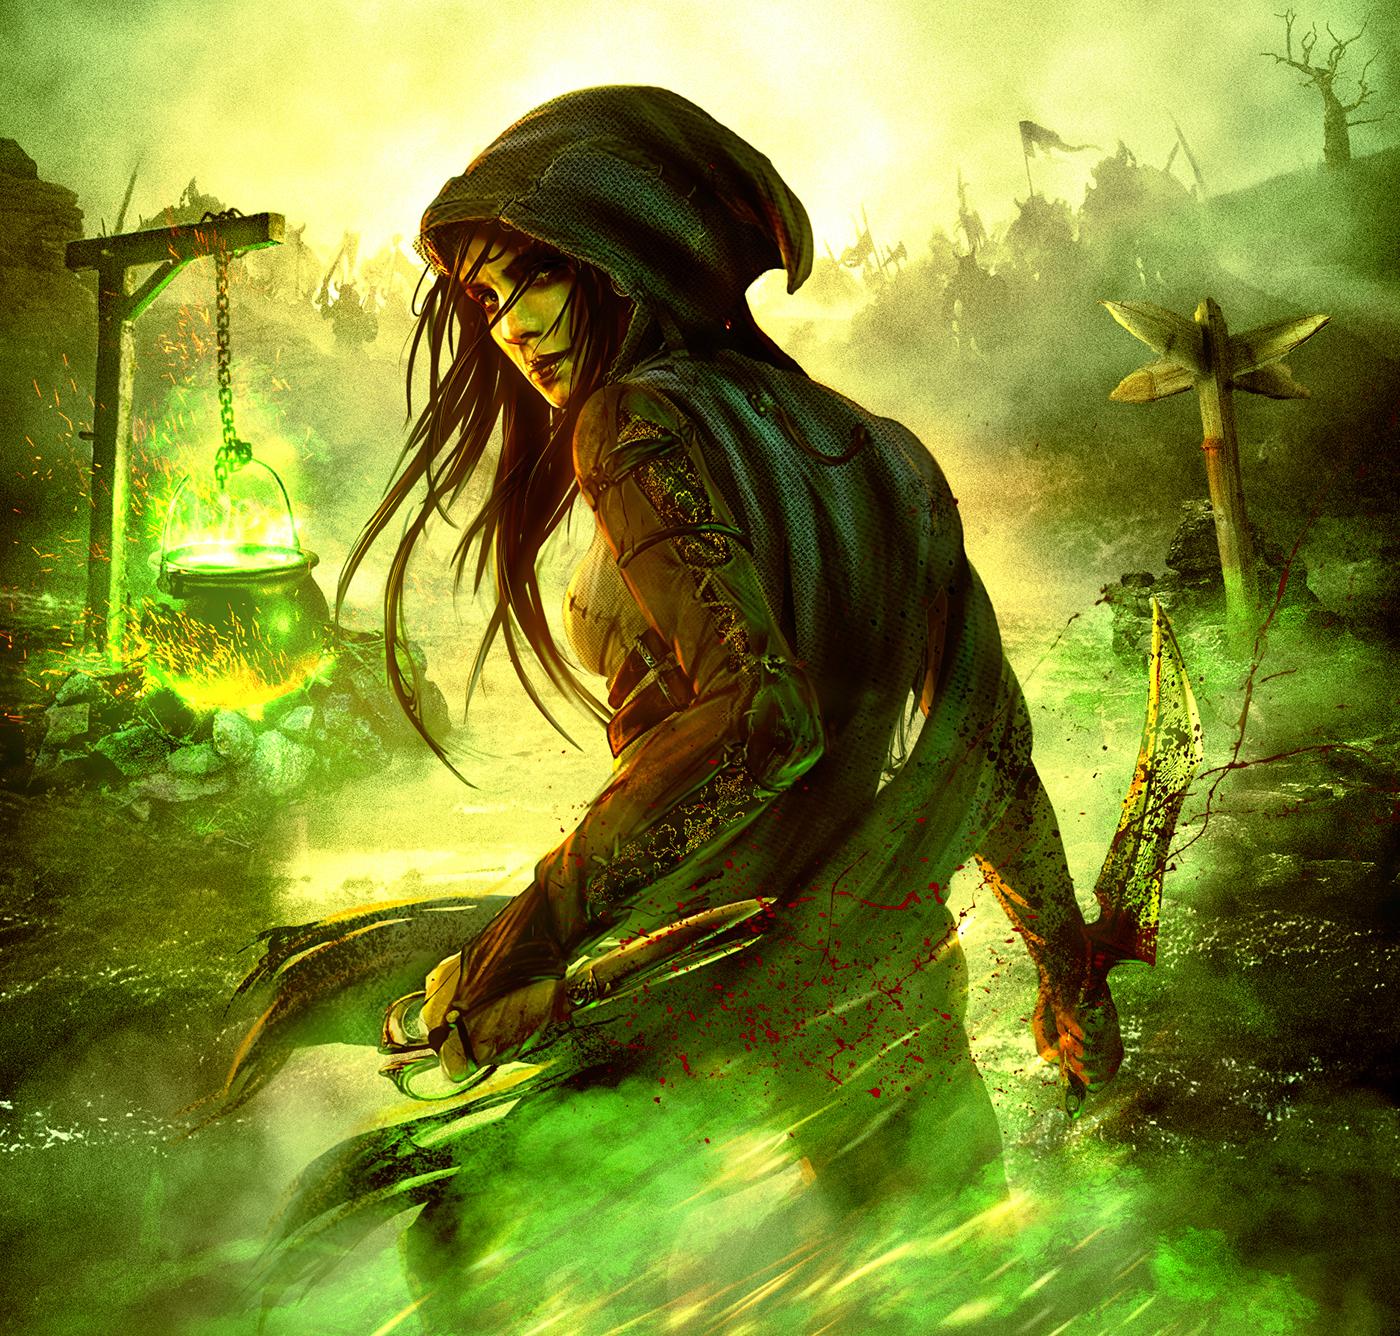 book book cover spook spook's Joseph Delaney delaney penguin random house Dark Fantasy green assassin